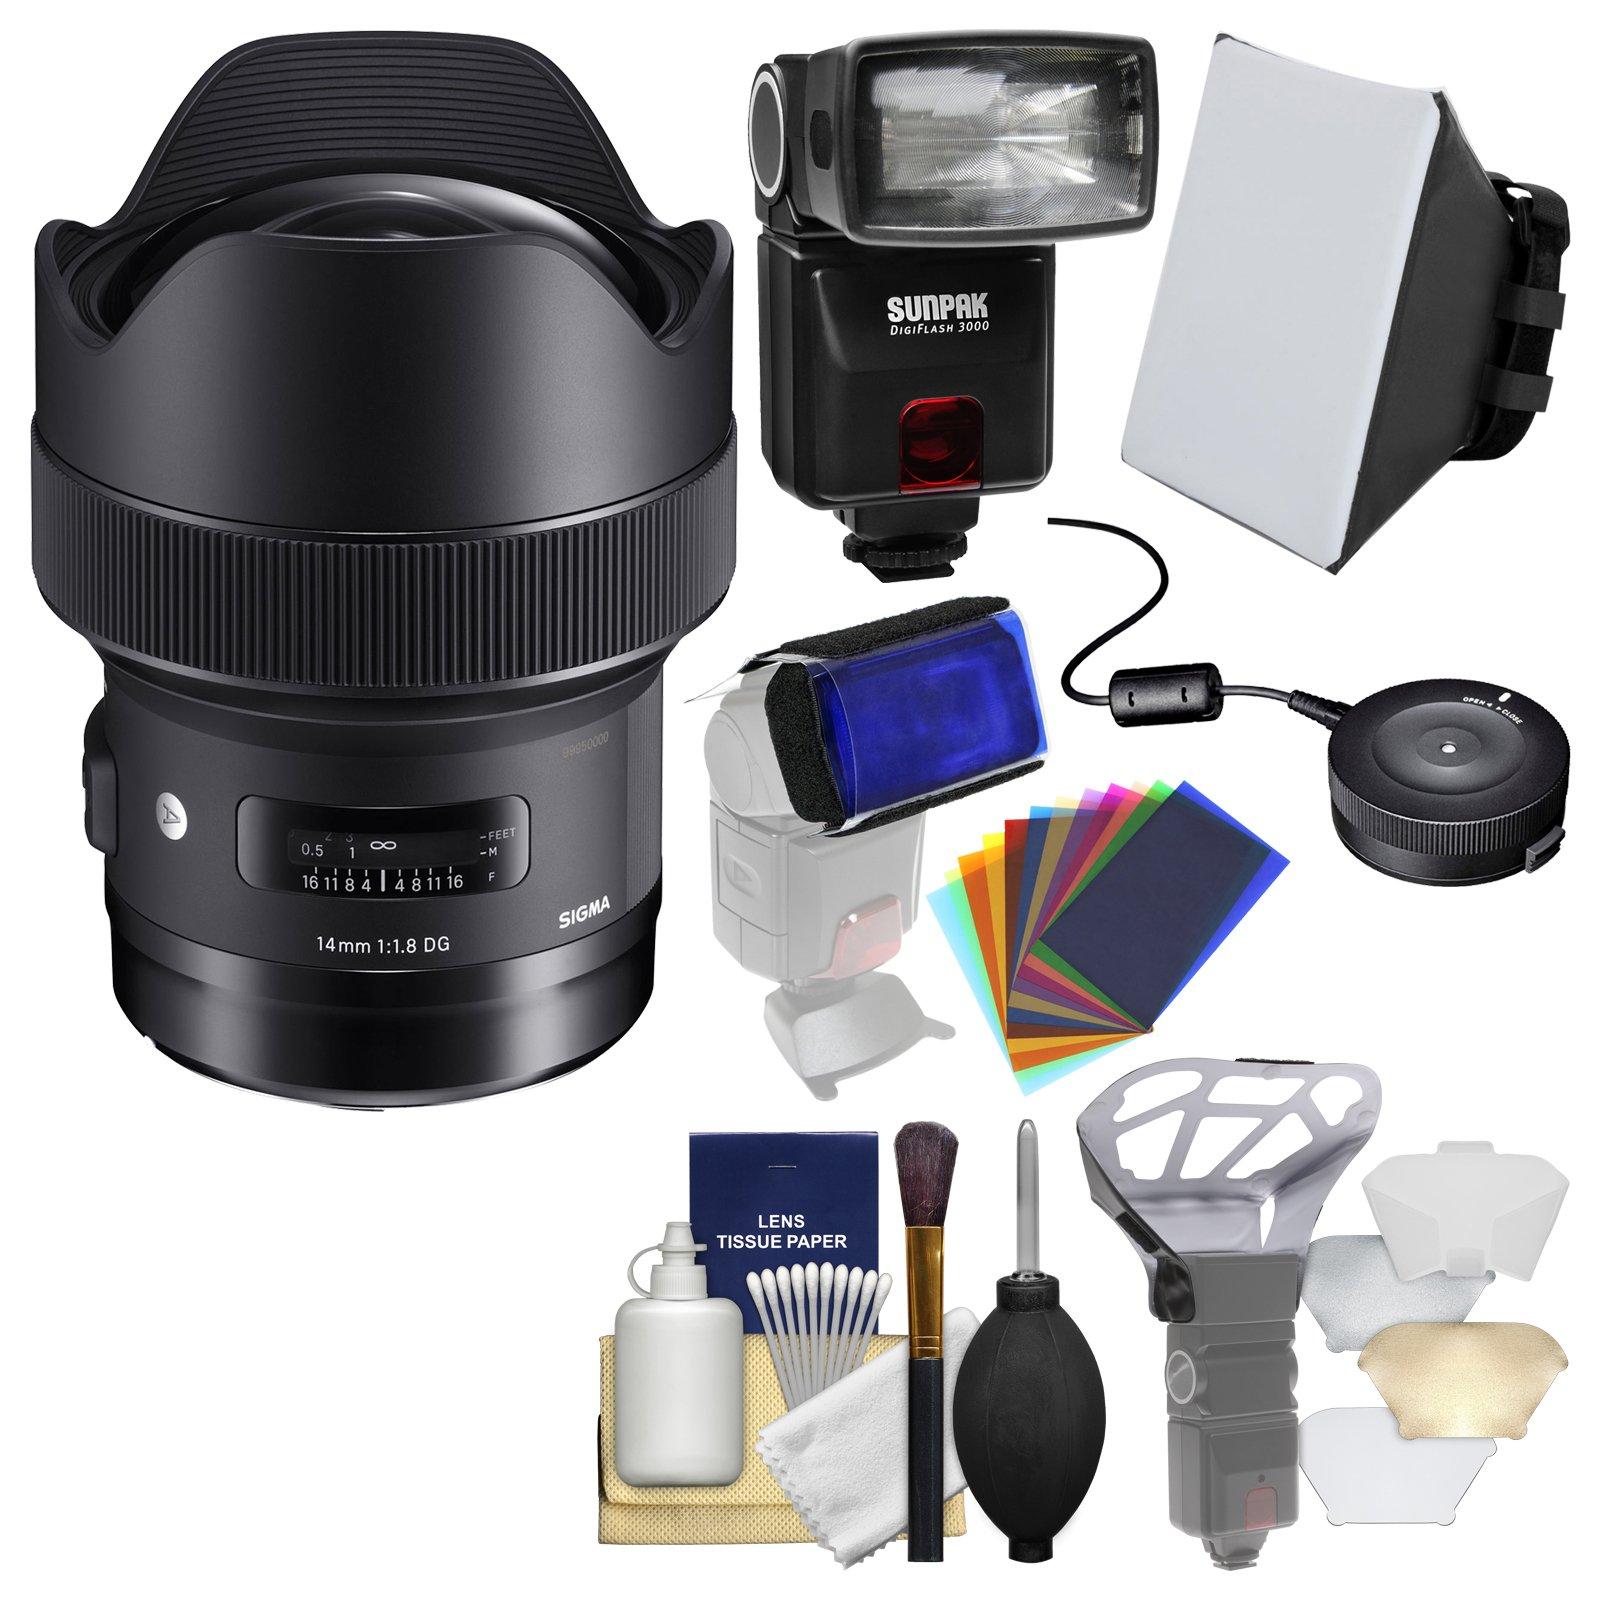 Sigma 14mm f/1.8 ART DG HSM Lens with USB Dock + E-TTL II Flash + Soft Box + Bouncer + Flash Gels + Kit for Canon EOS Digital SLR Cameras